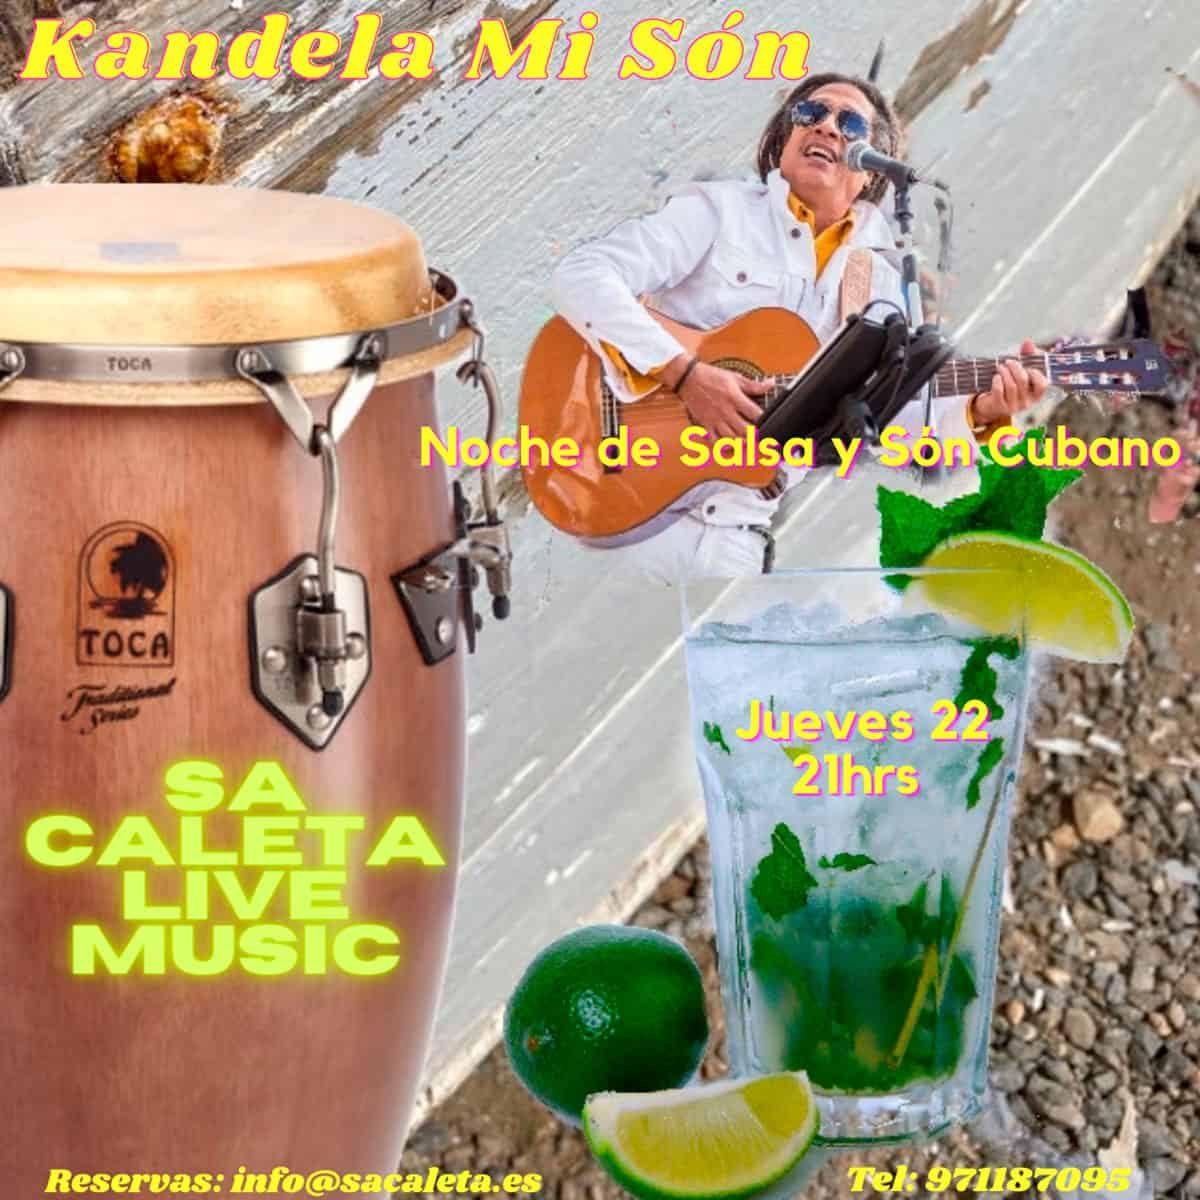 sa-caleta-live-music-kandela-mi-son-astarte-ibiza-2021-welcometoibiza